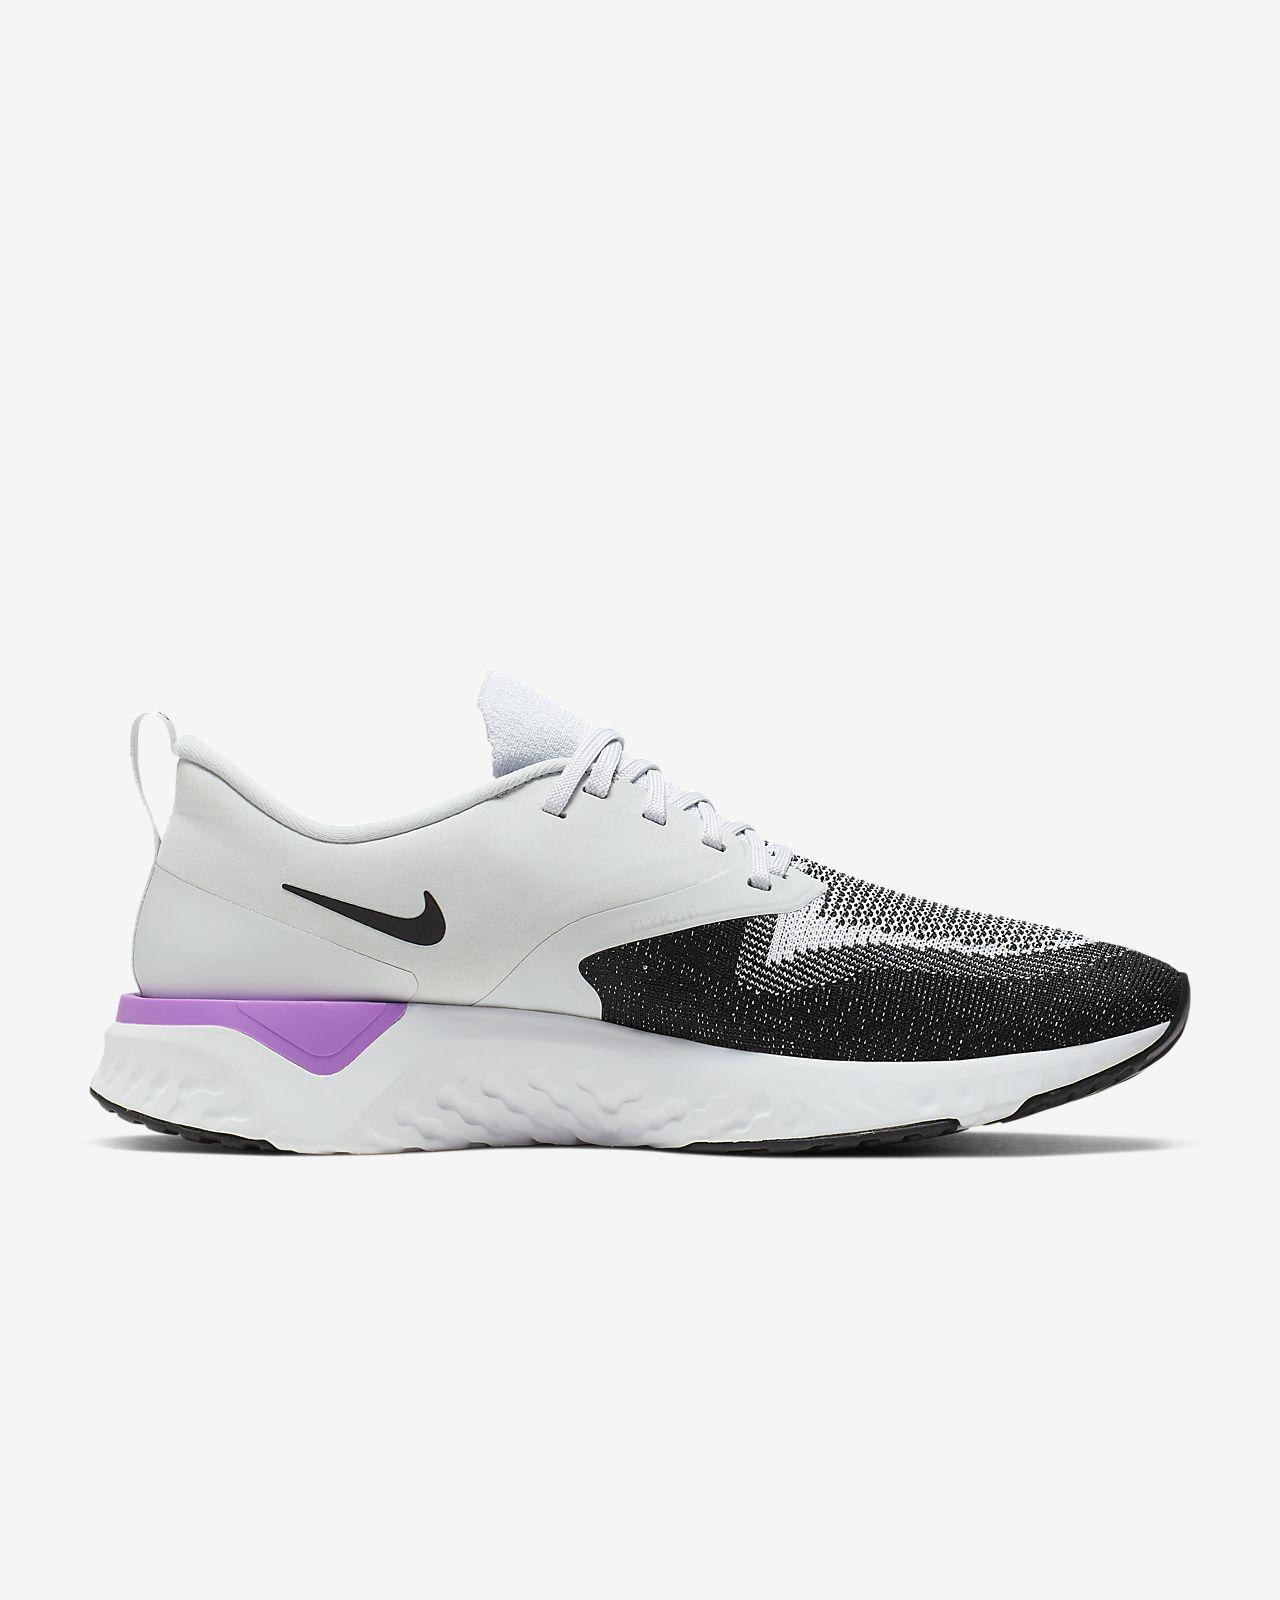 Nike Free 4.0 Flyknit Männer Laufschuh Pure Platinum Weiß